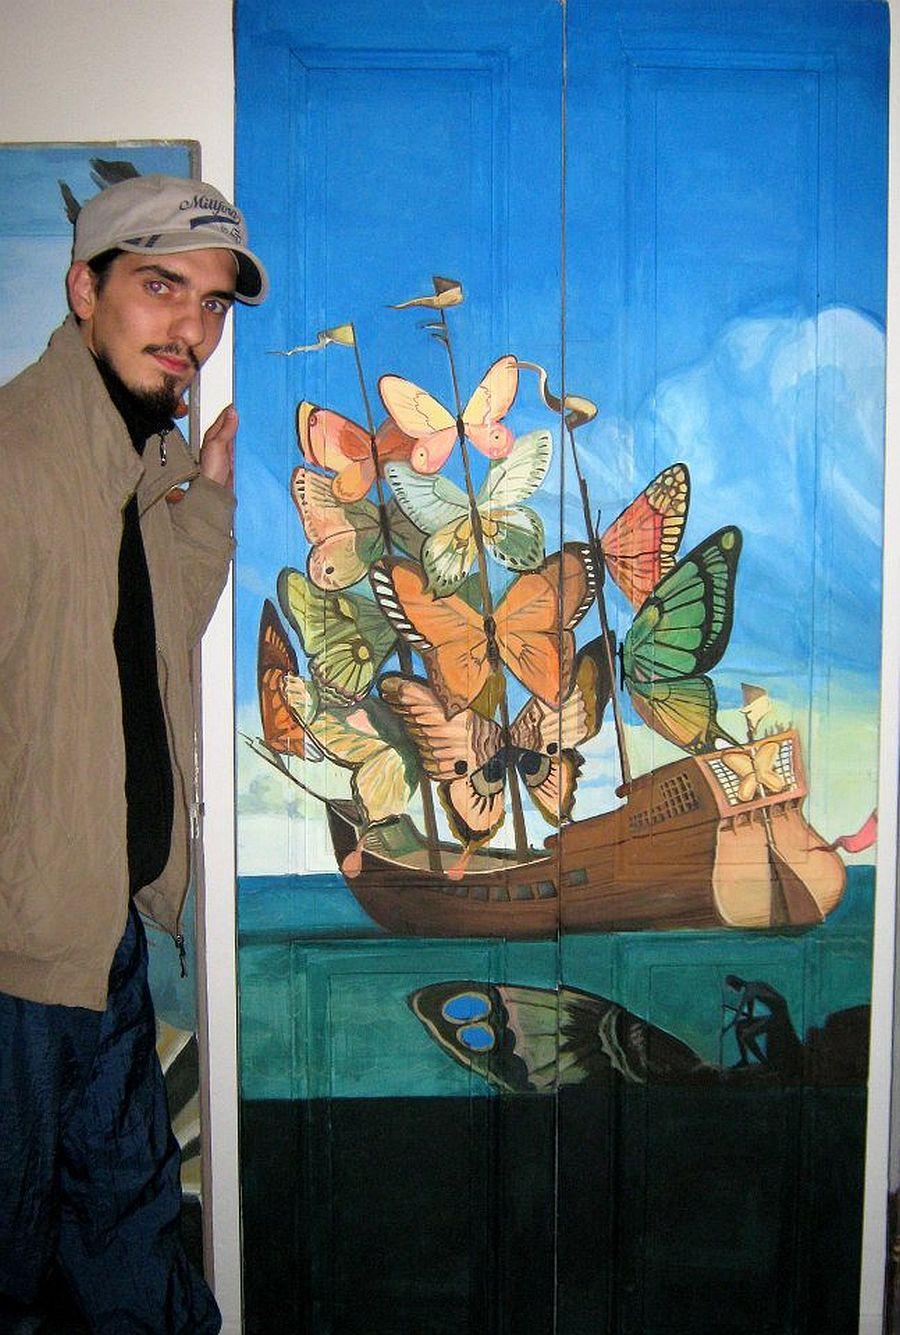 adelaparvu.com despre usi pictate, artist Andrei Radu (4)